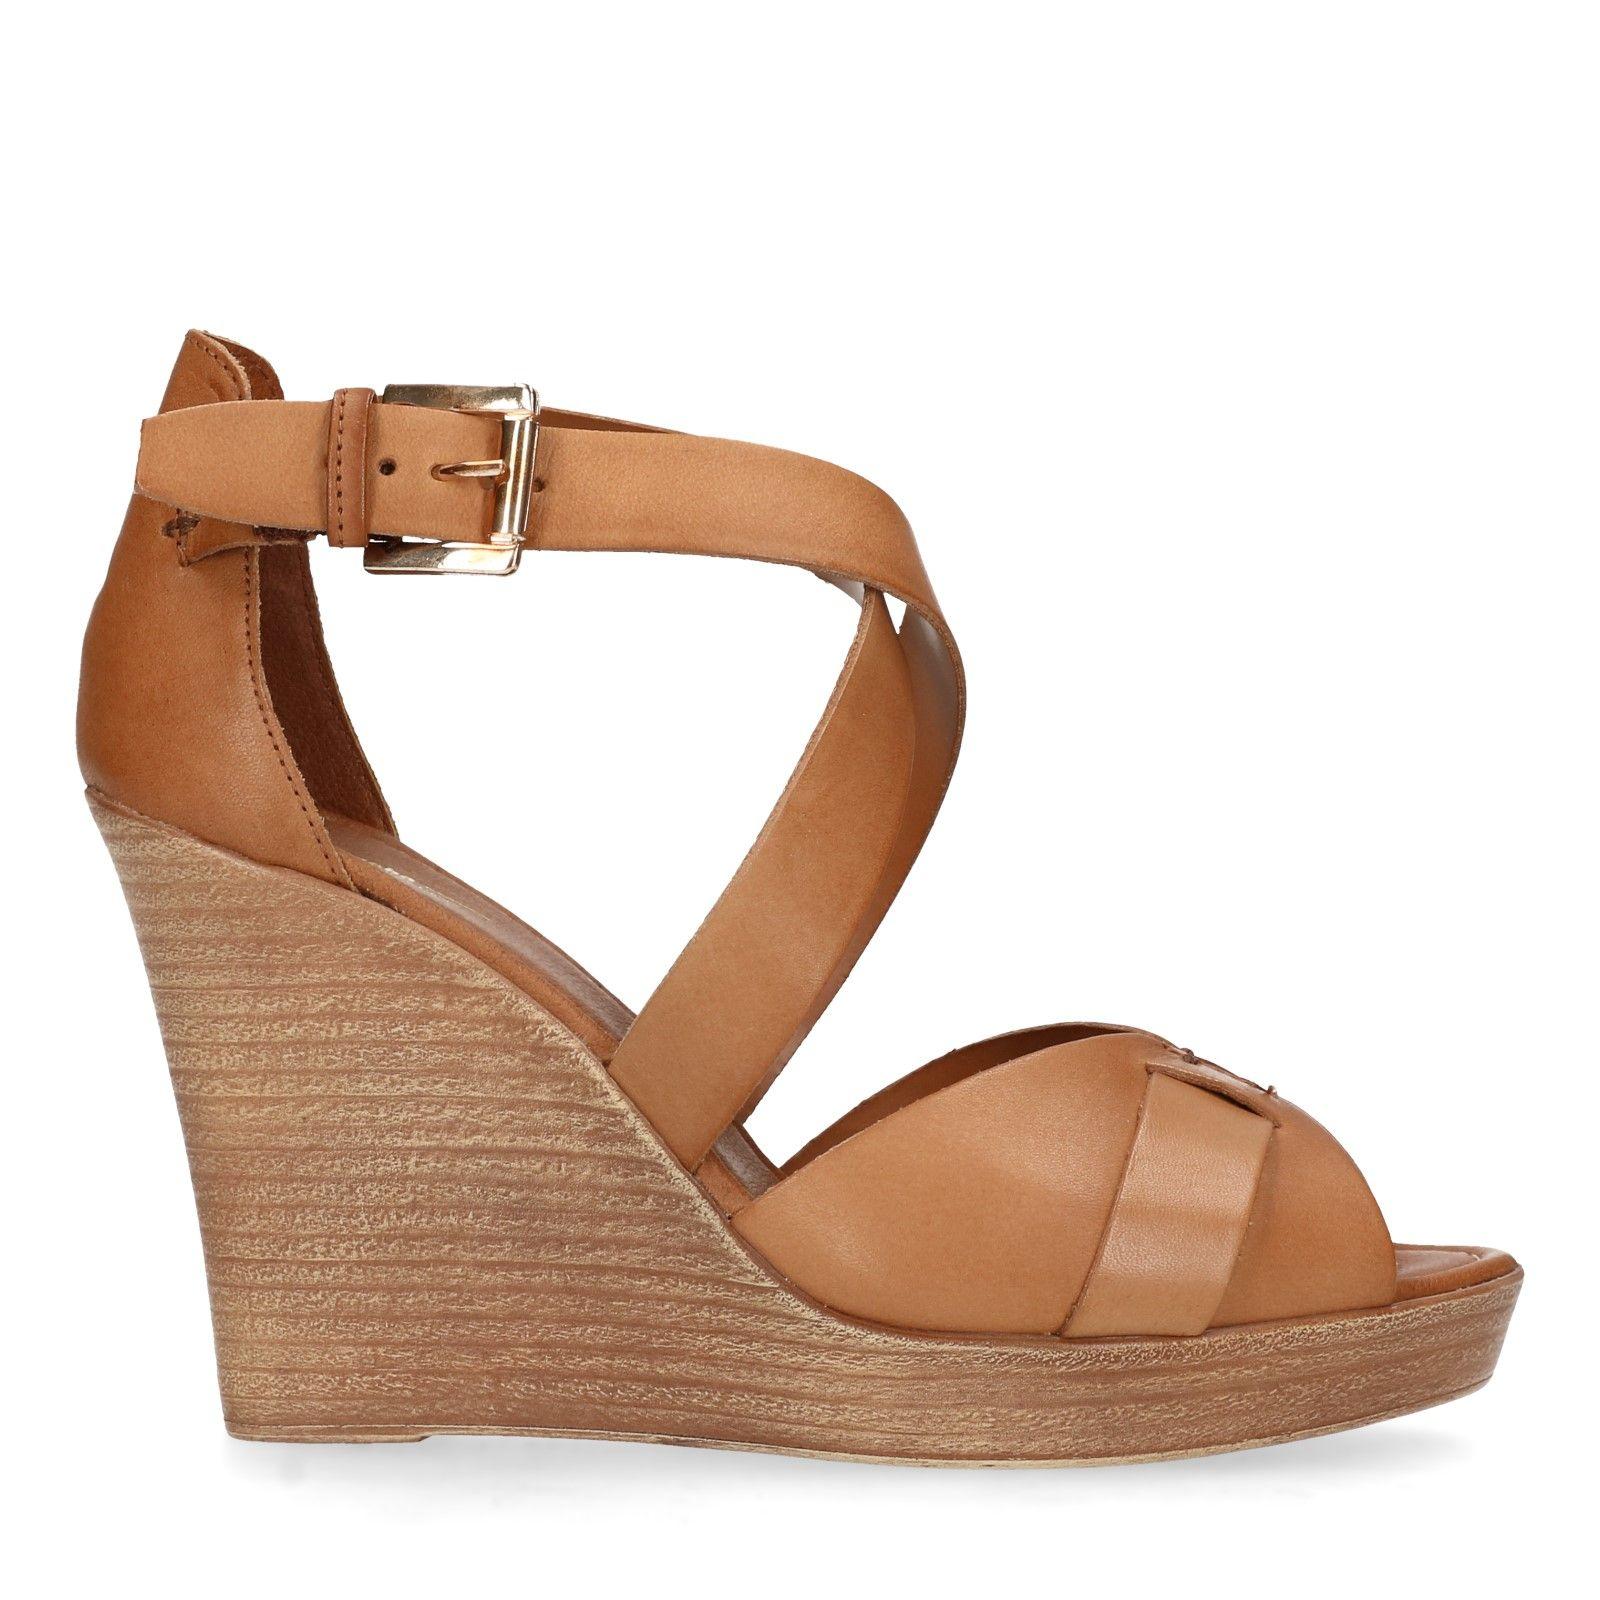 Sacha Bruine sandalen met sleehak